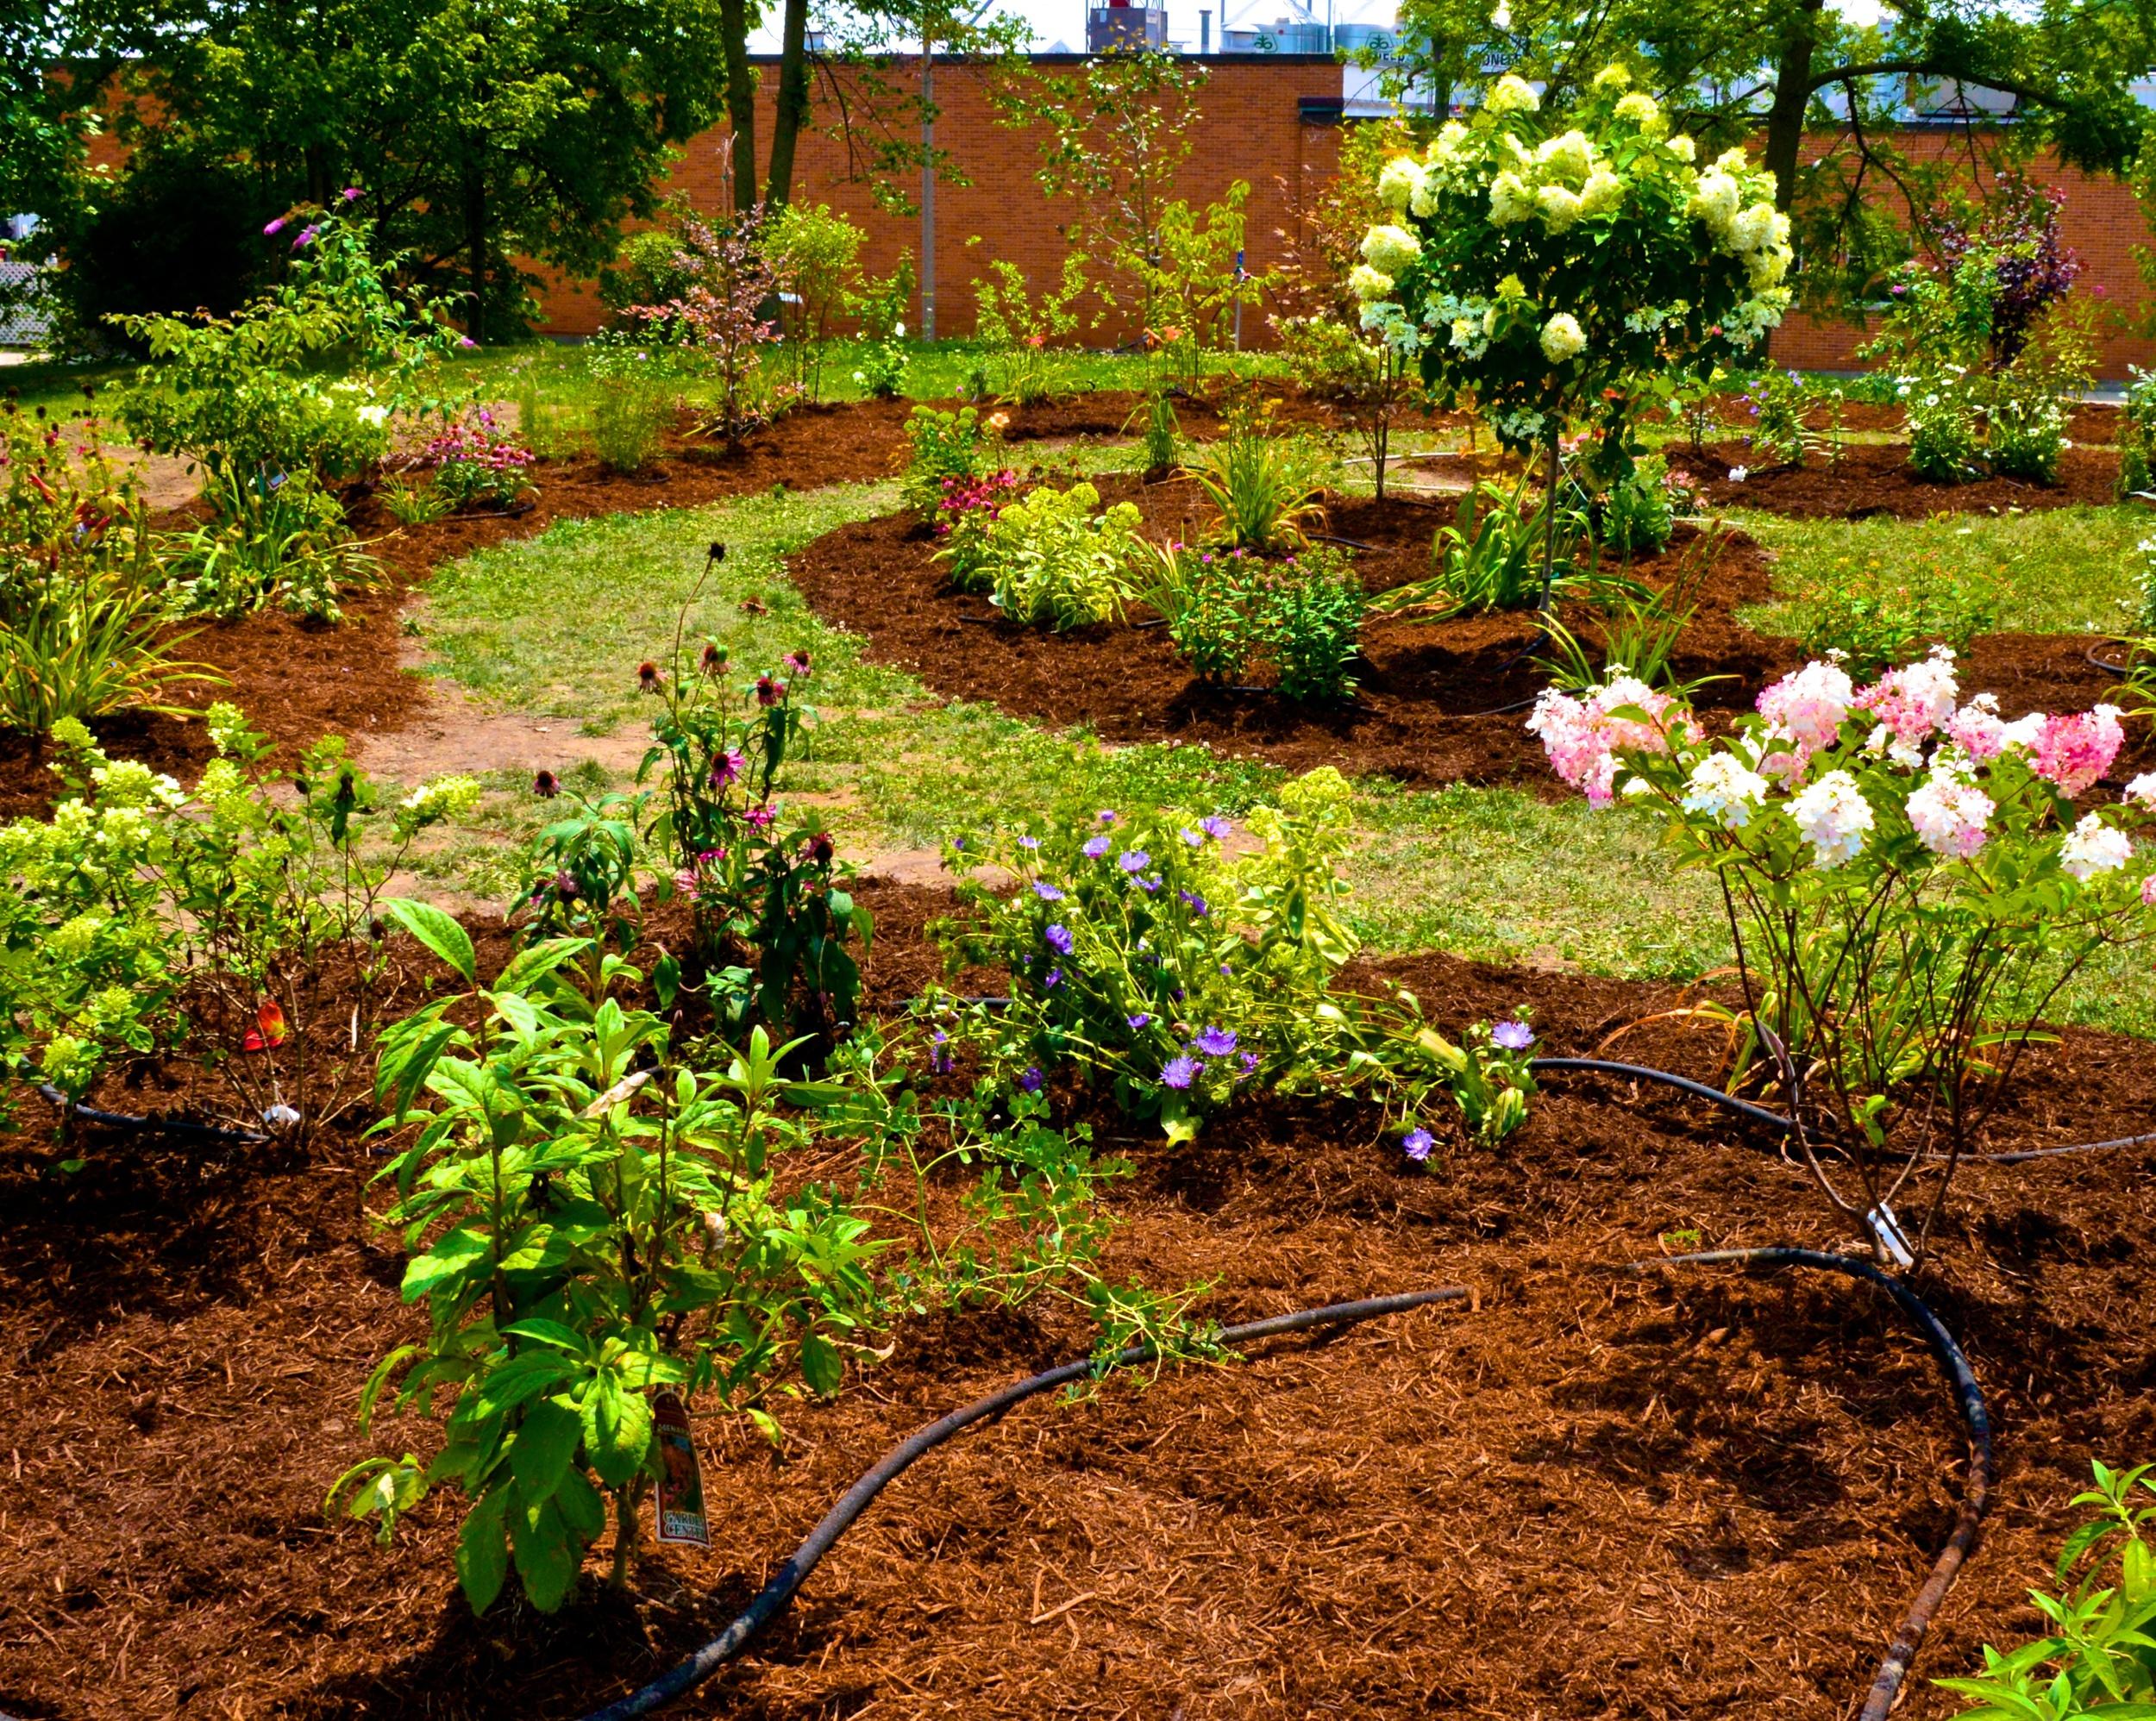 2014-08-02  Gardens 8 2 2014 (24).jpg